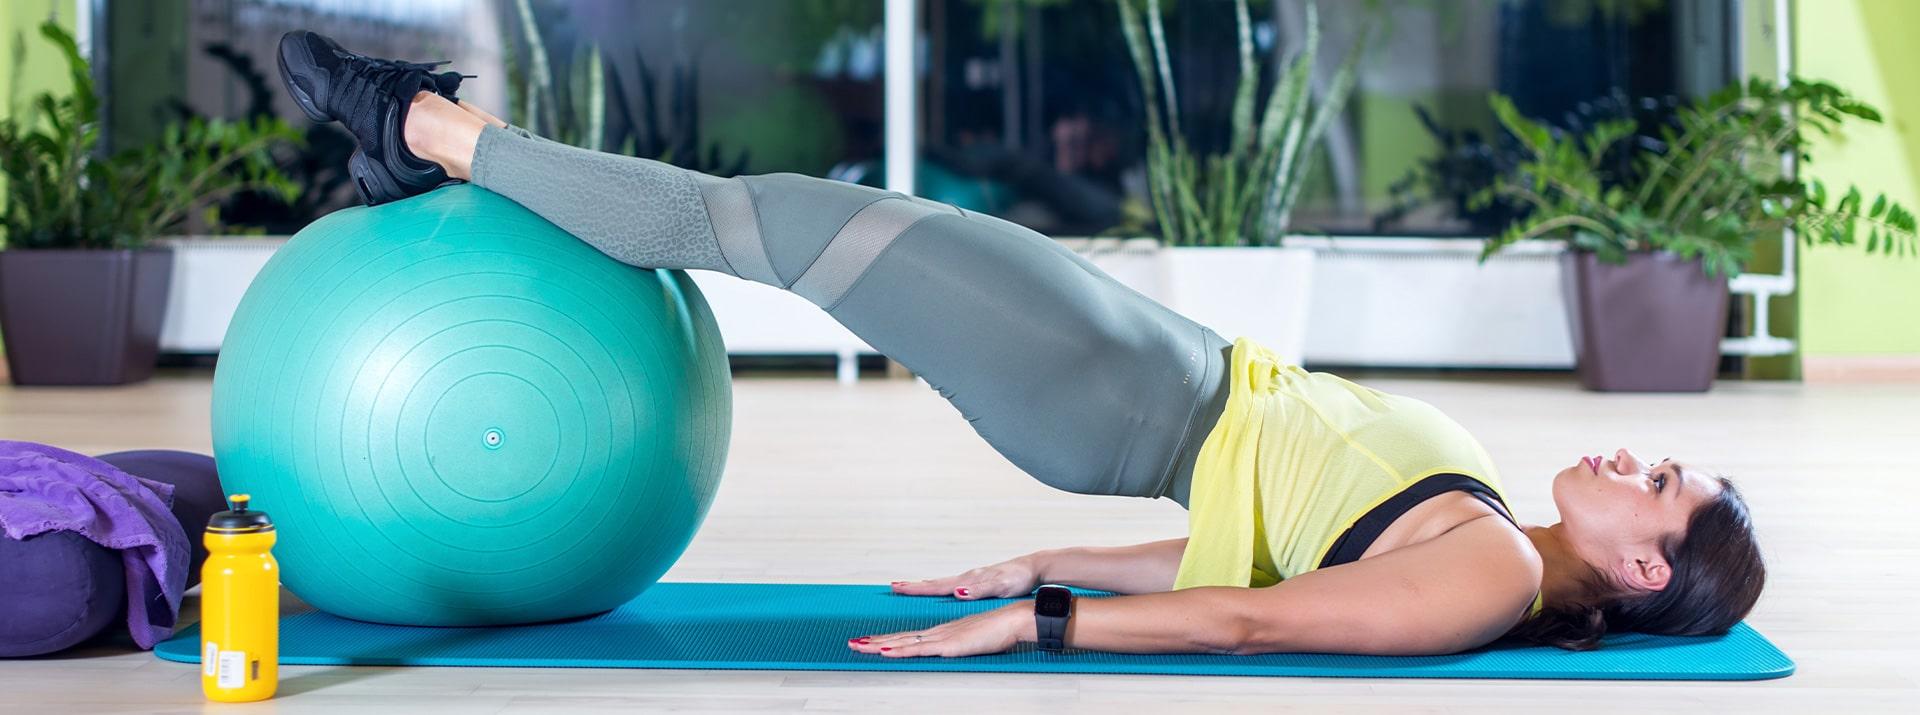 Improve Pelvic Floor Functioning and Pelvic Health